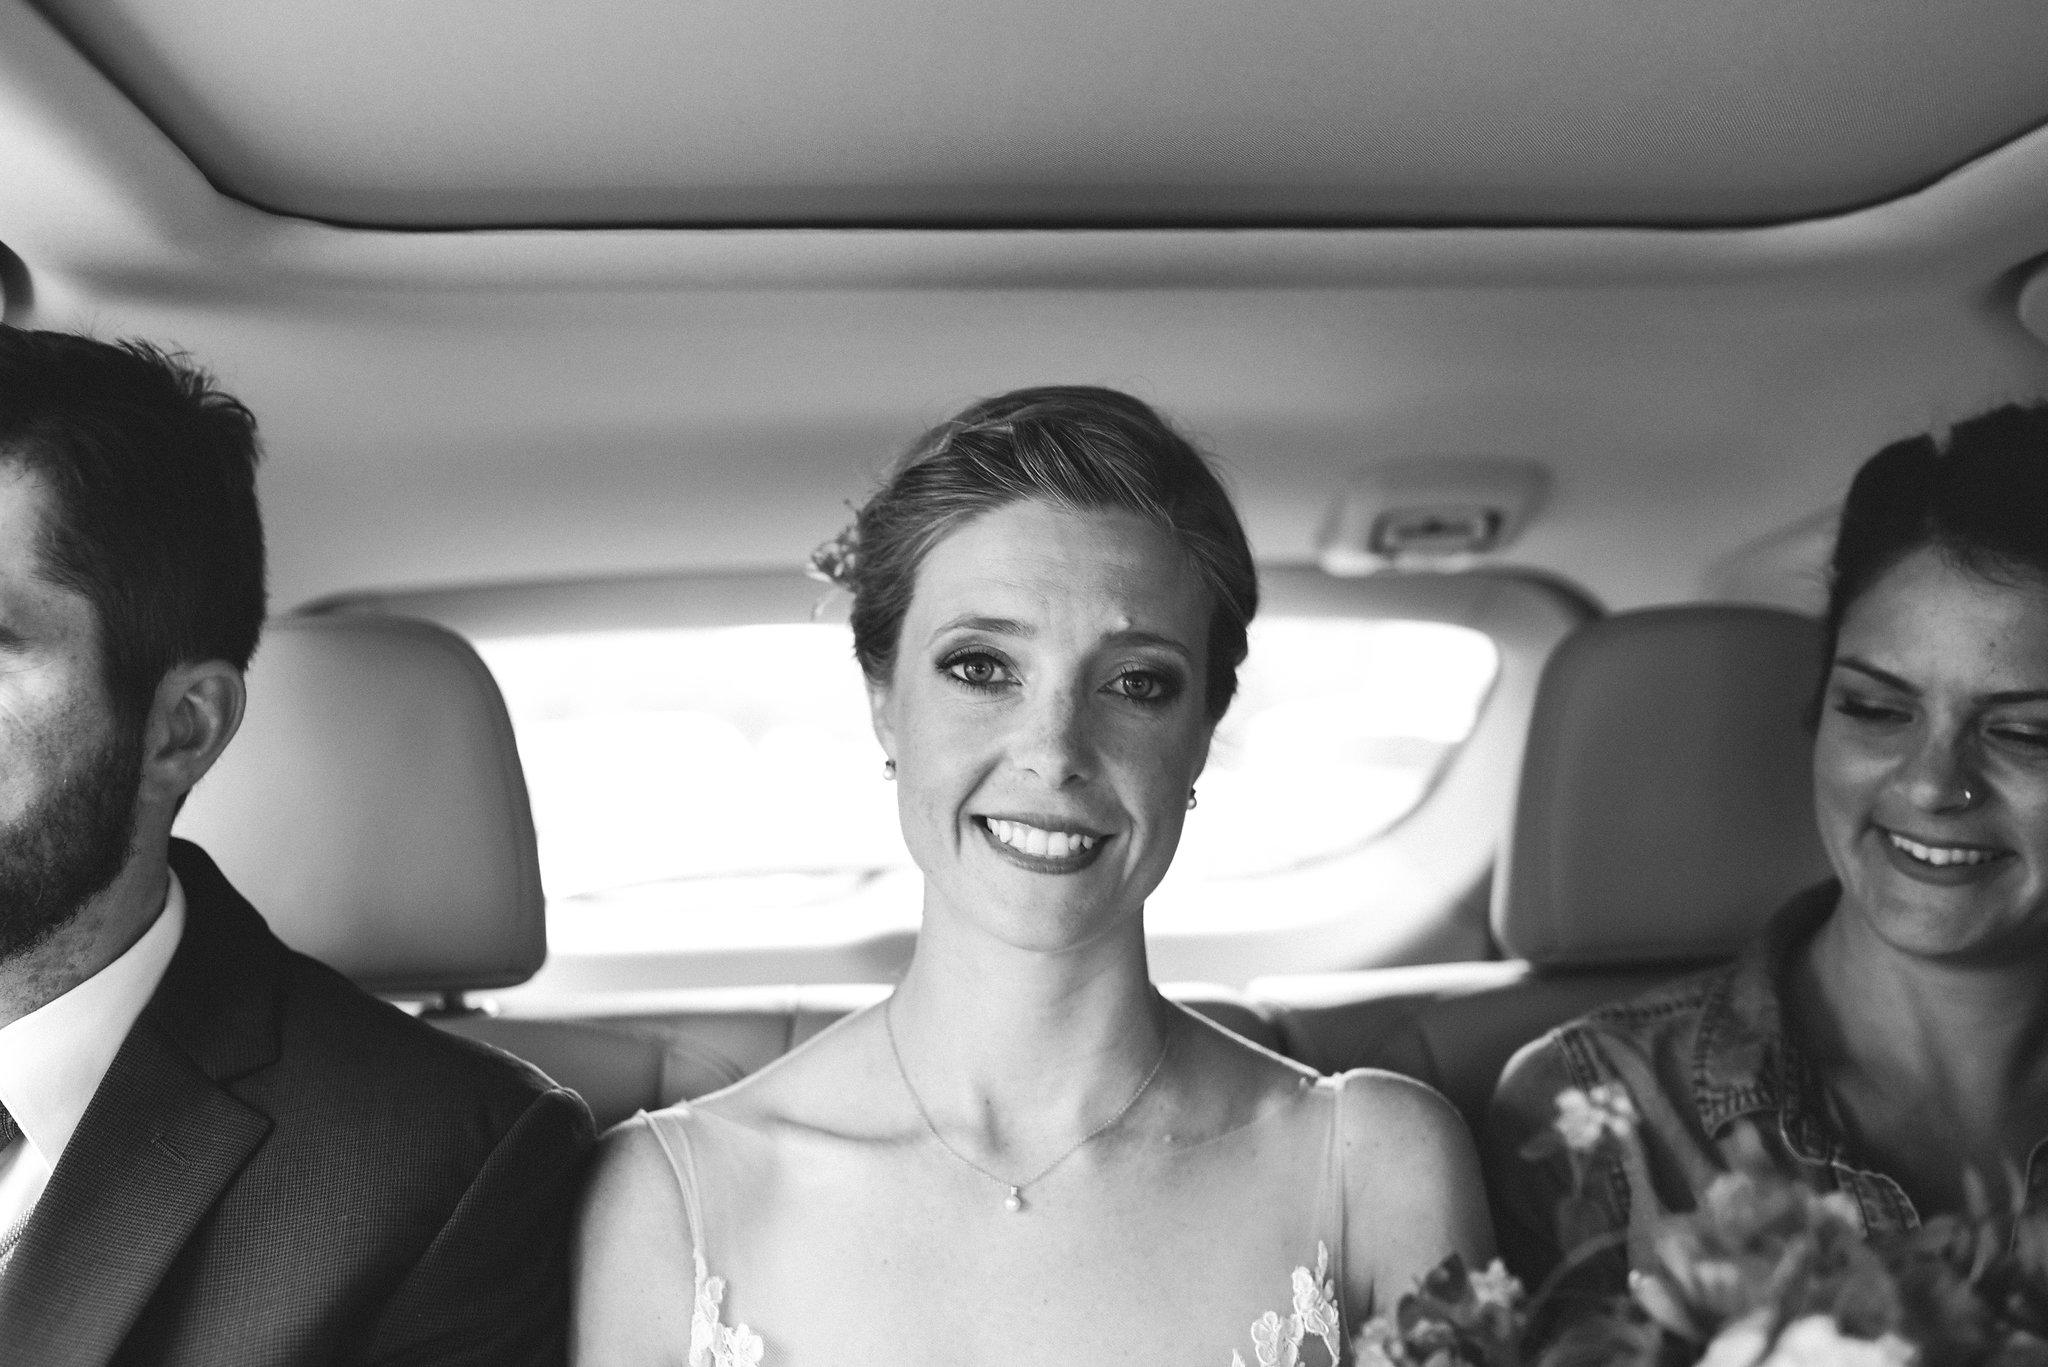 Alexandria, Virginia, Fall Wedding, Autumn, Historic Wedding, Old Town, DC, Going to the Ceremony, Black and White, The London Bob Hair Design, Bride Photo, Bride Detail